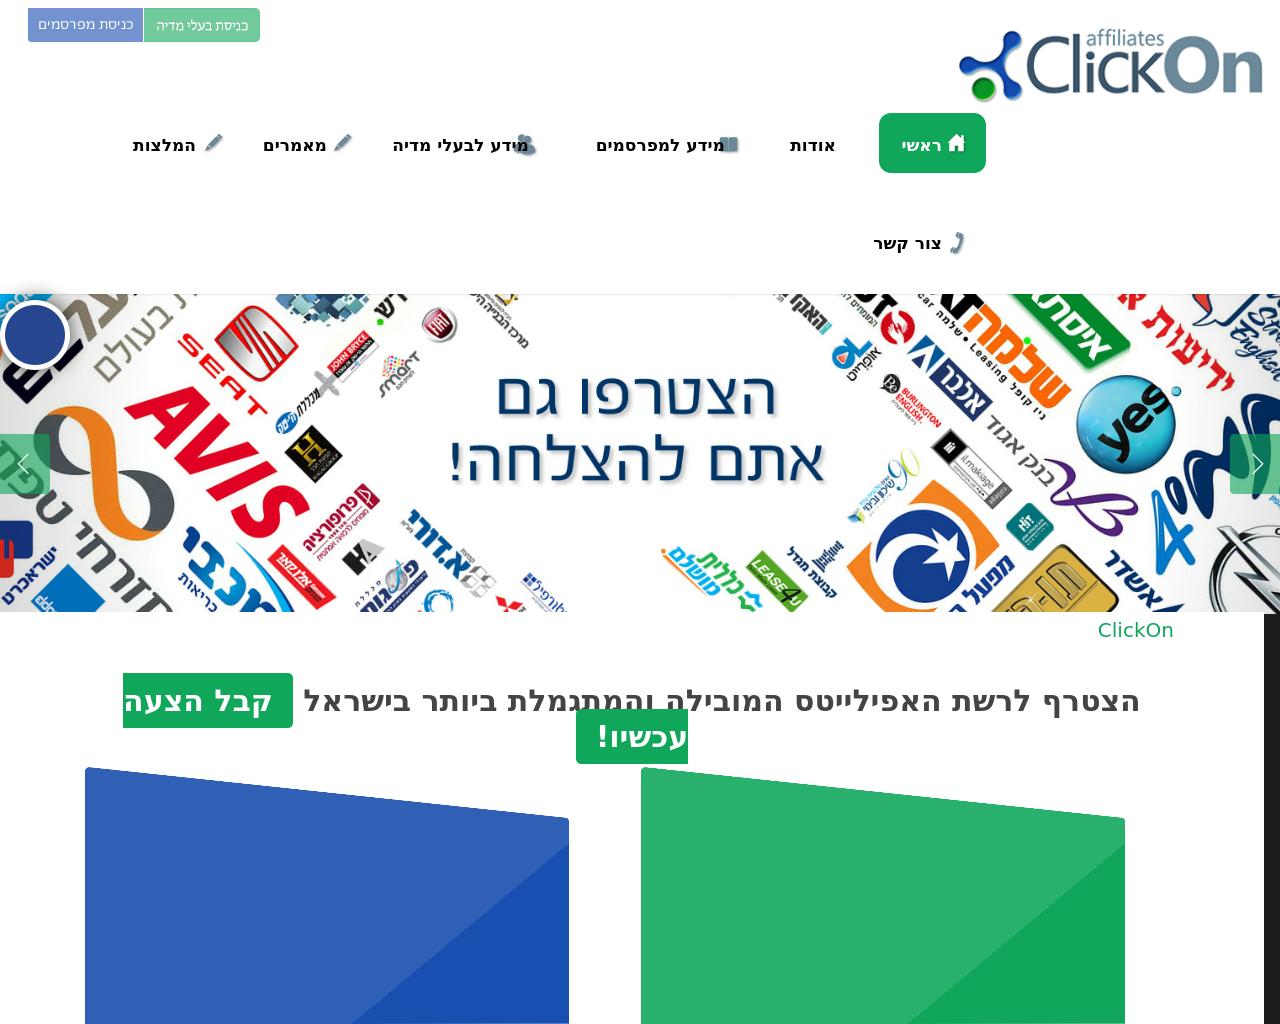 ClickOn-Affiliates-Advertising-Reviews-Pricing